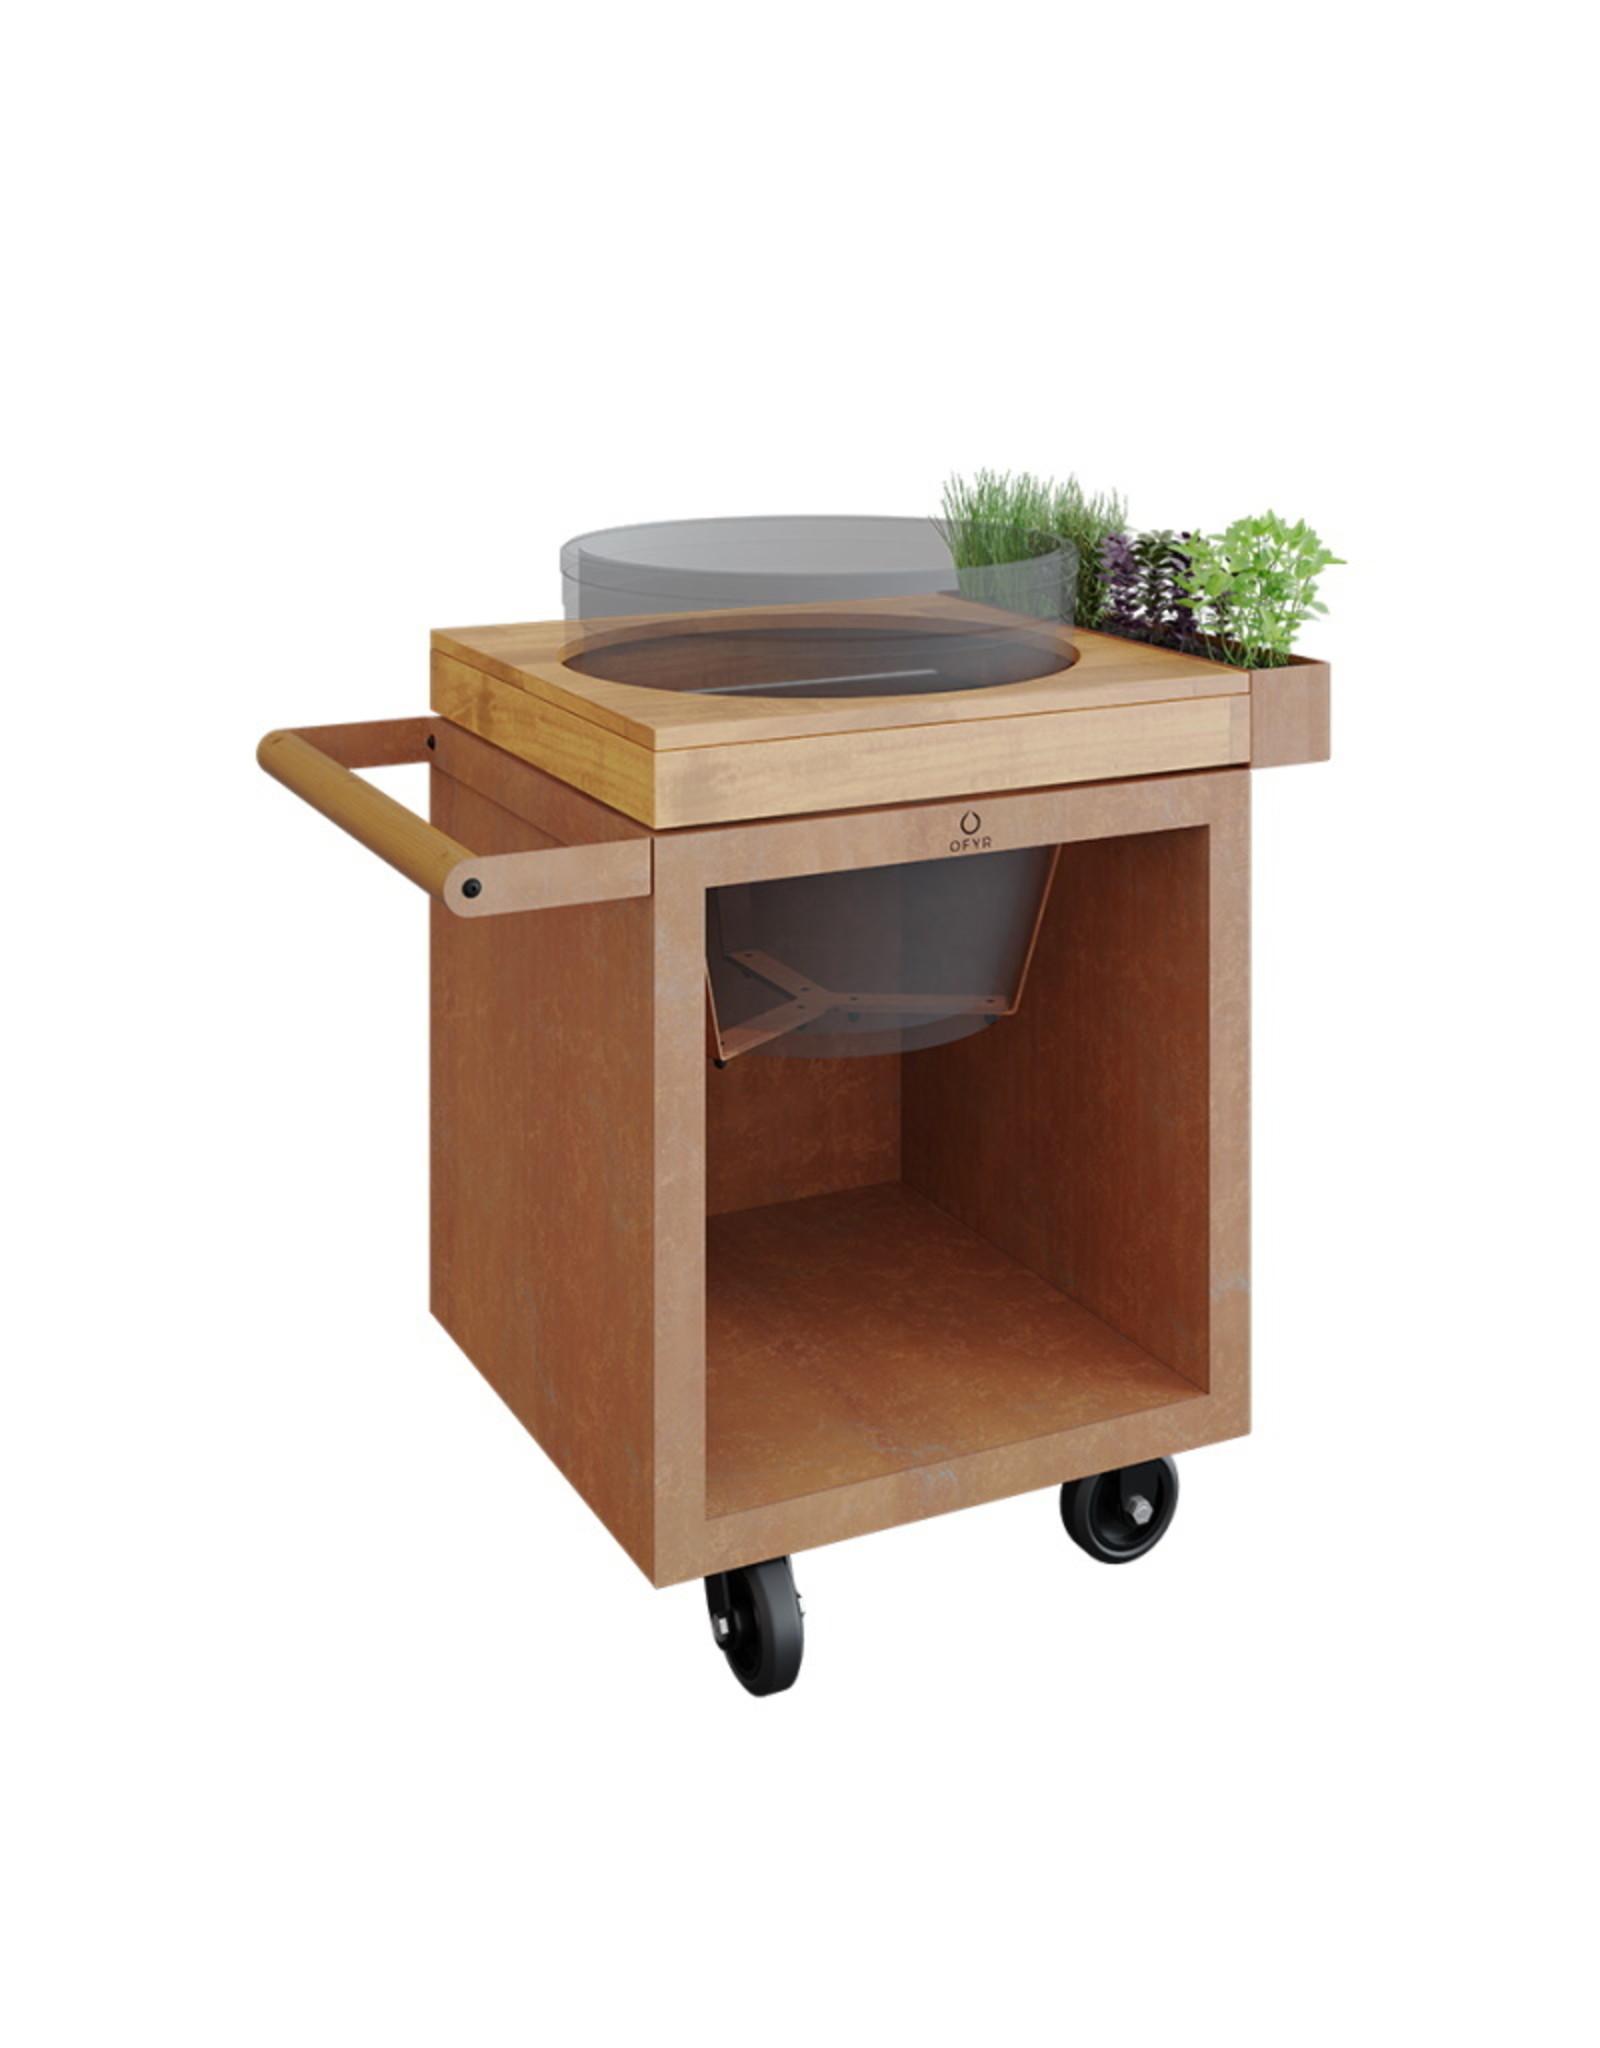 OFYR Kamado Table Corten 65 PRO Teak Wood BGE